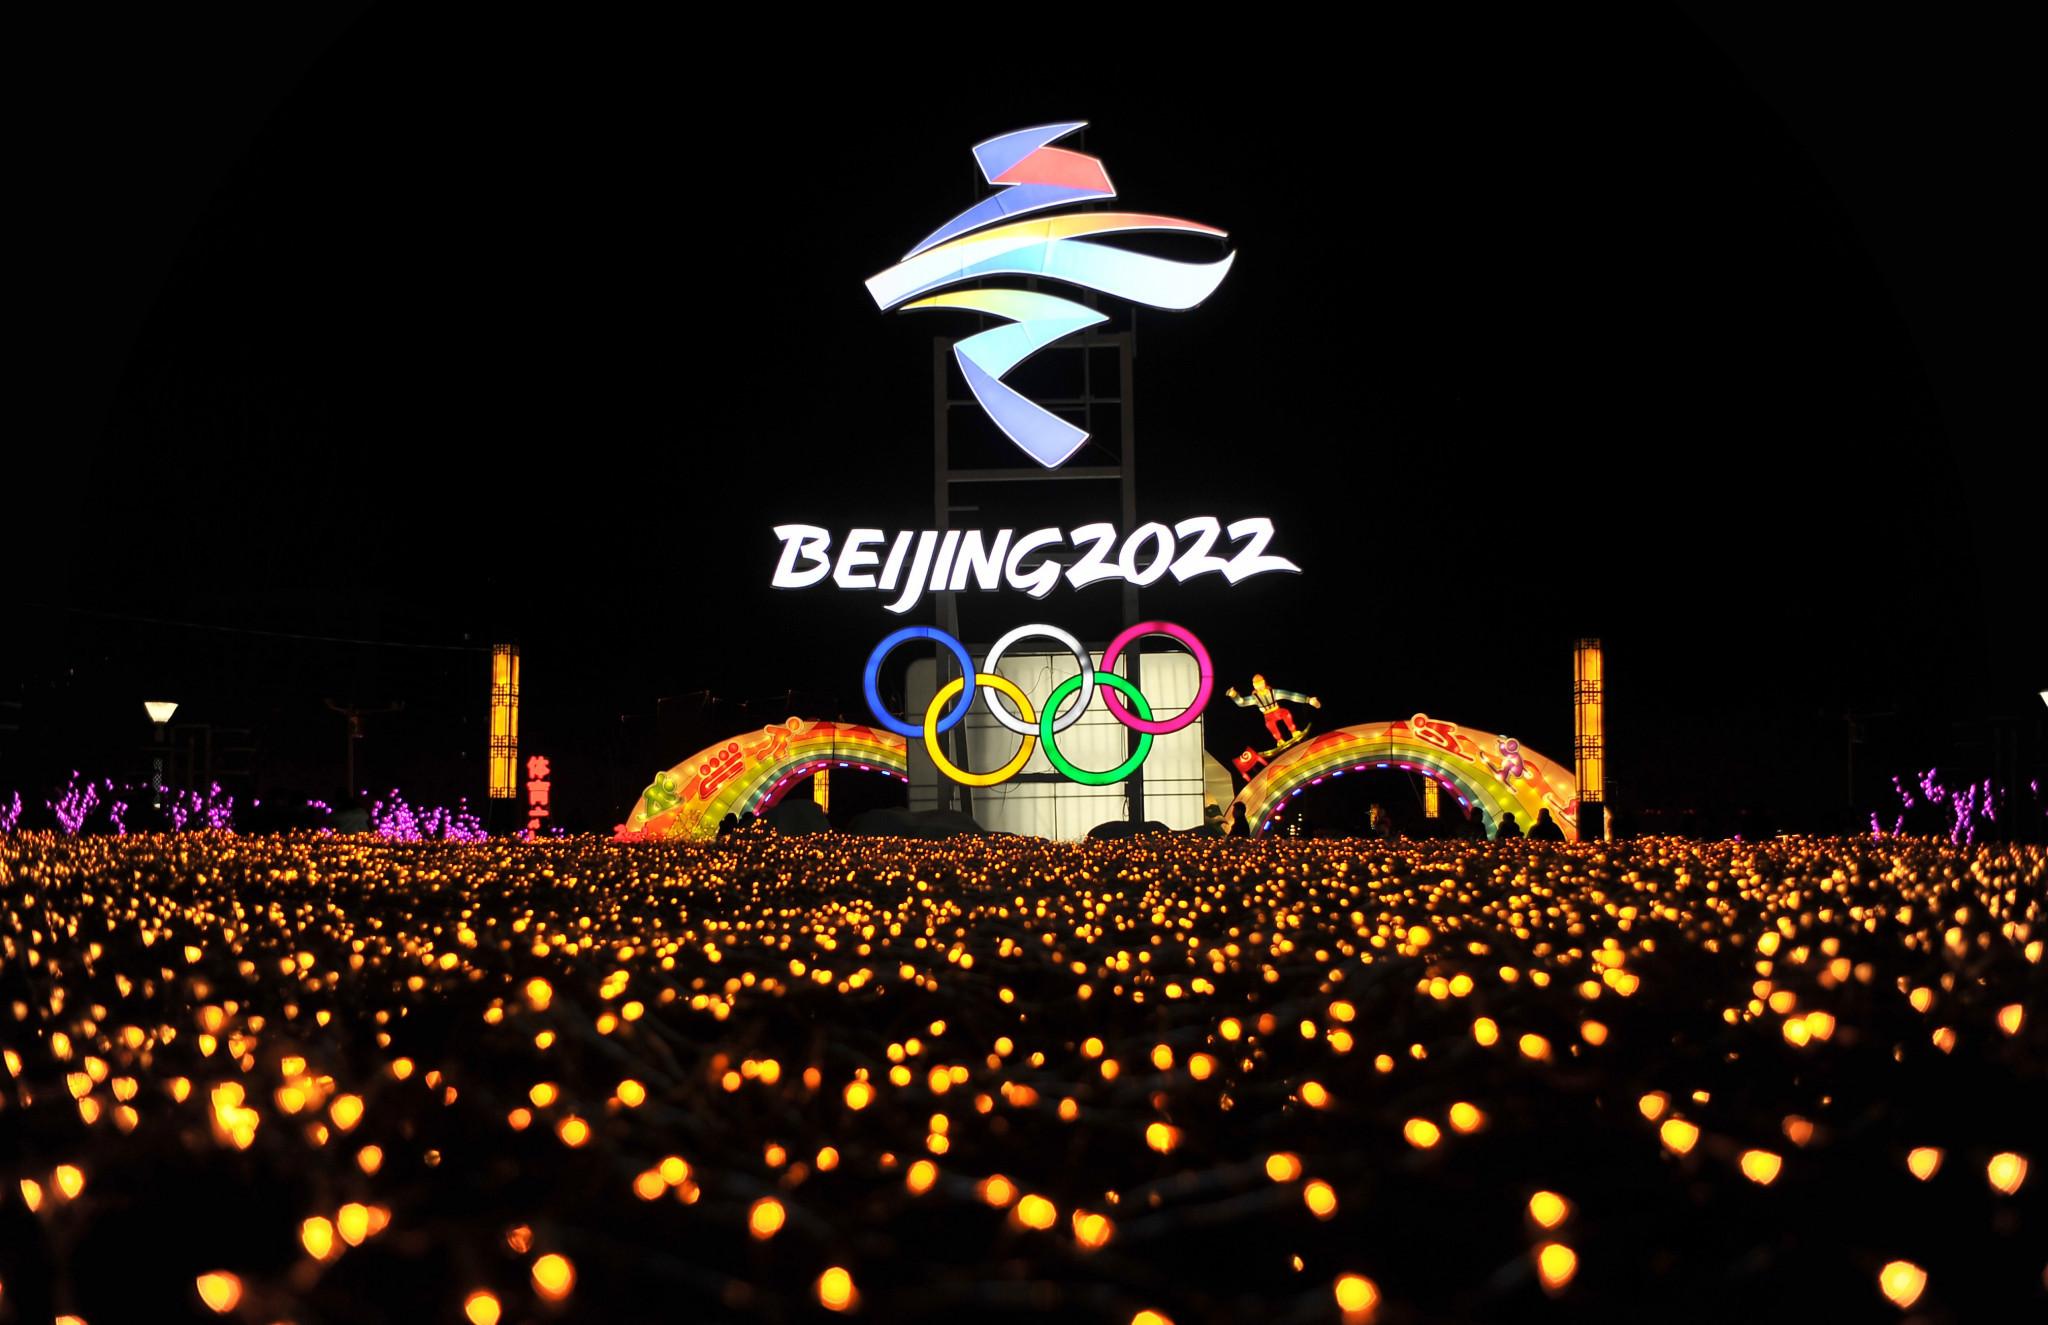 олимпиада 2022 в Пекине